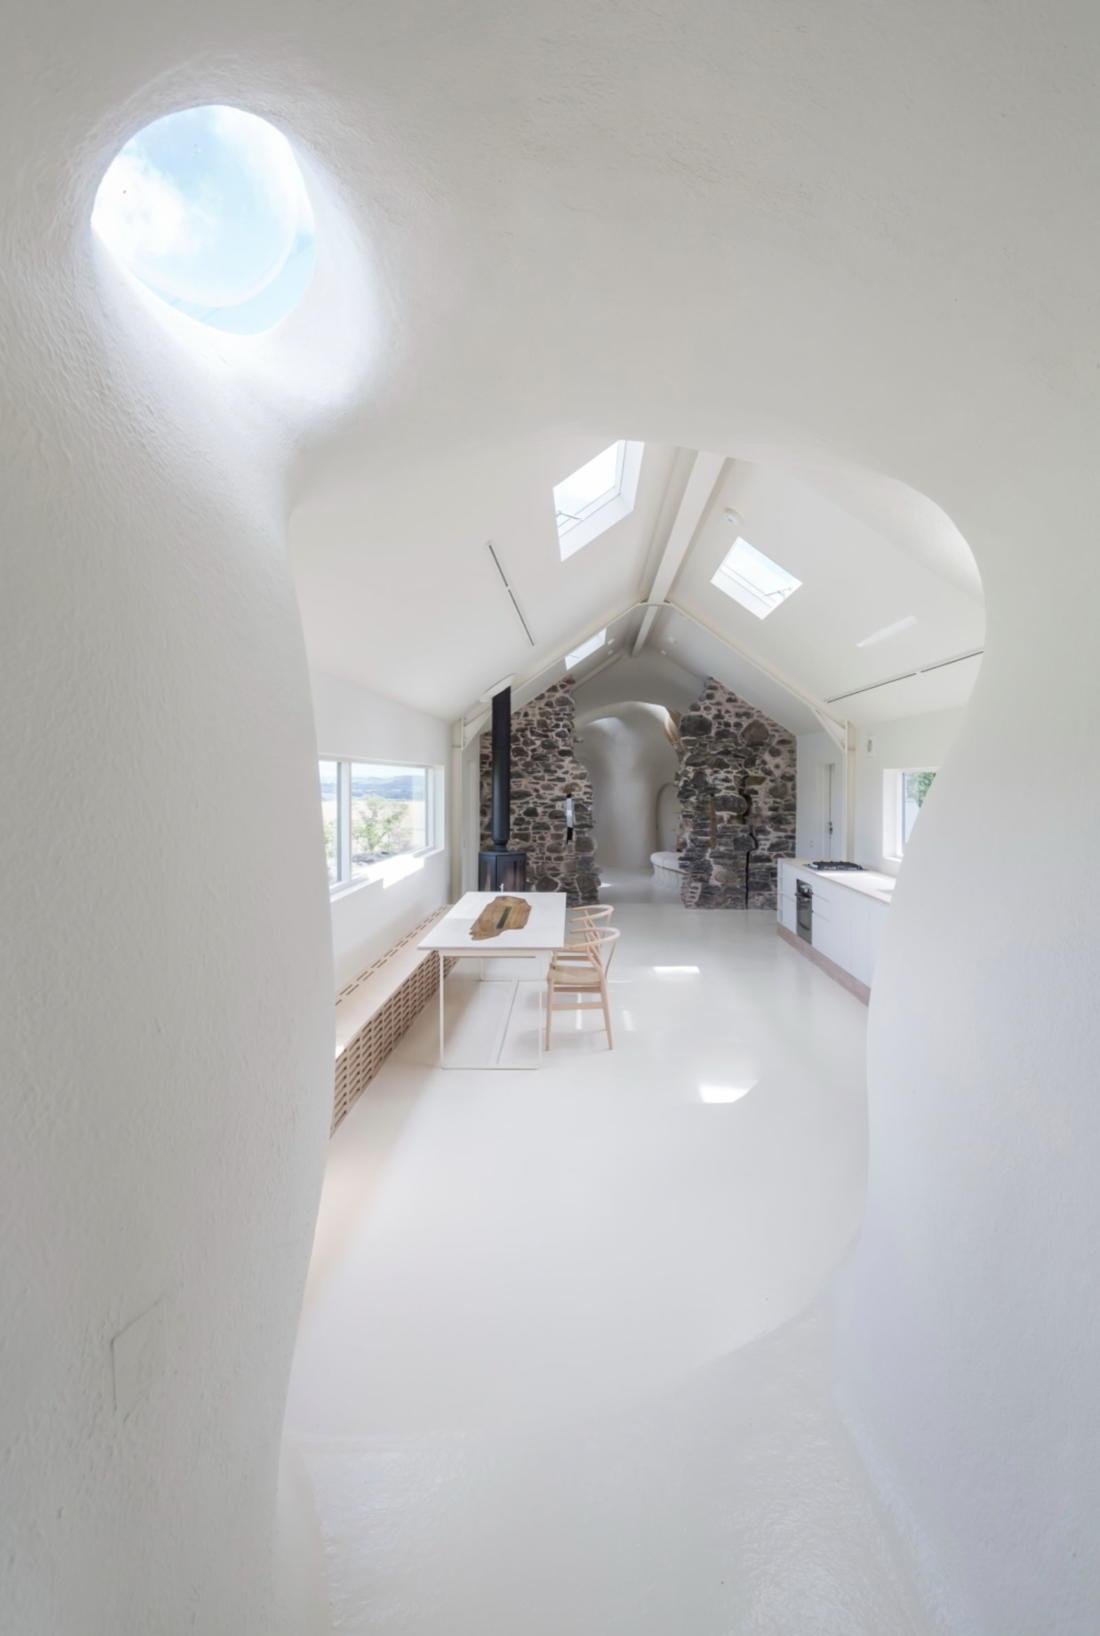 Совместный проект студий Lily Jencks и Nathanael Dorent Architecture 16